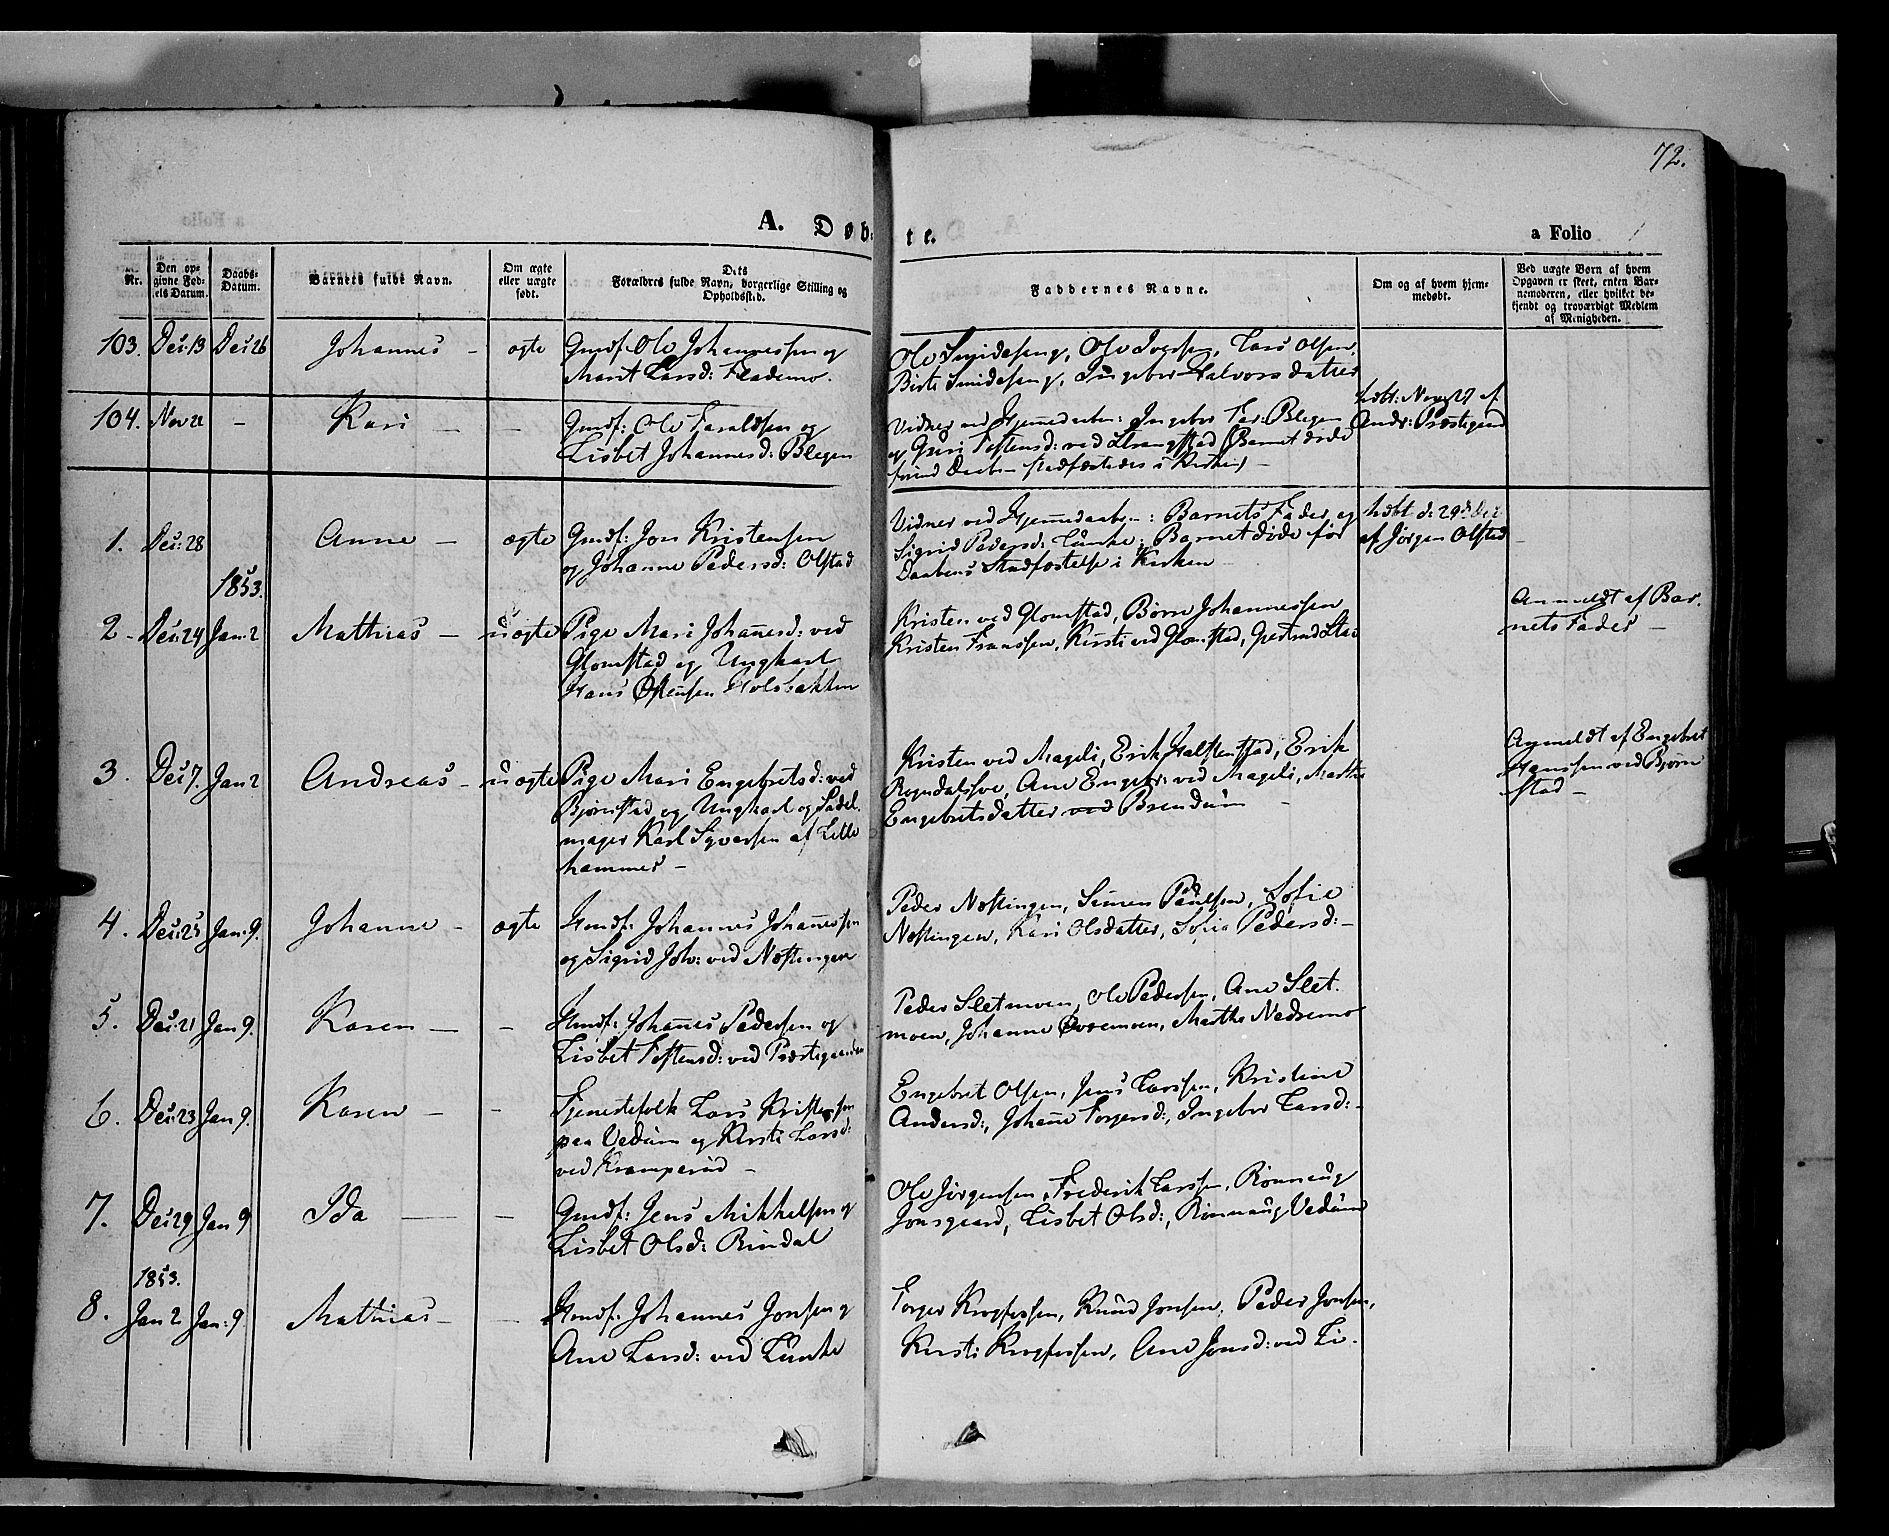 SAH, Øyer prestekontor, Ministerialbok nr. 5, 1842-1857, s. 72